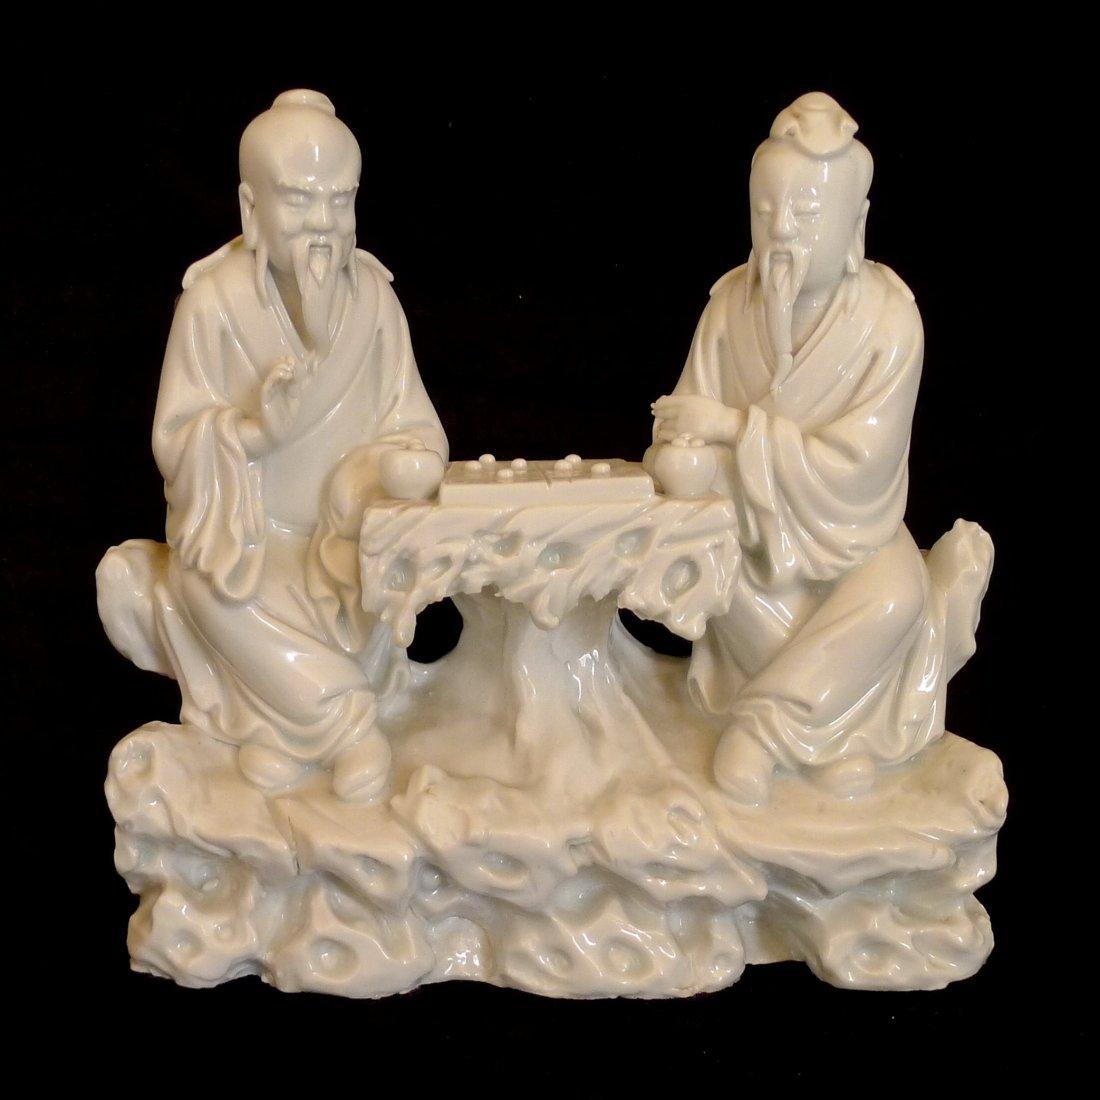 Chinese Dehua White Porcelain  - Playing Chess